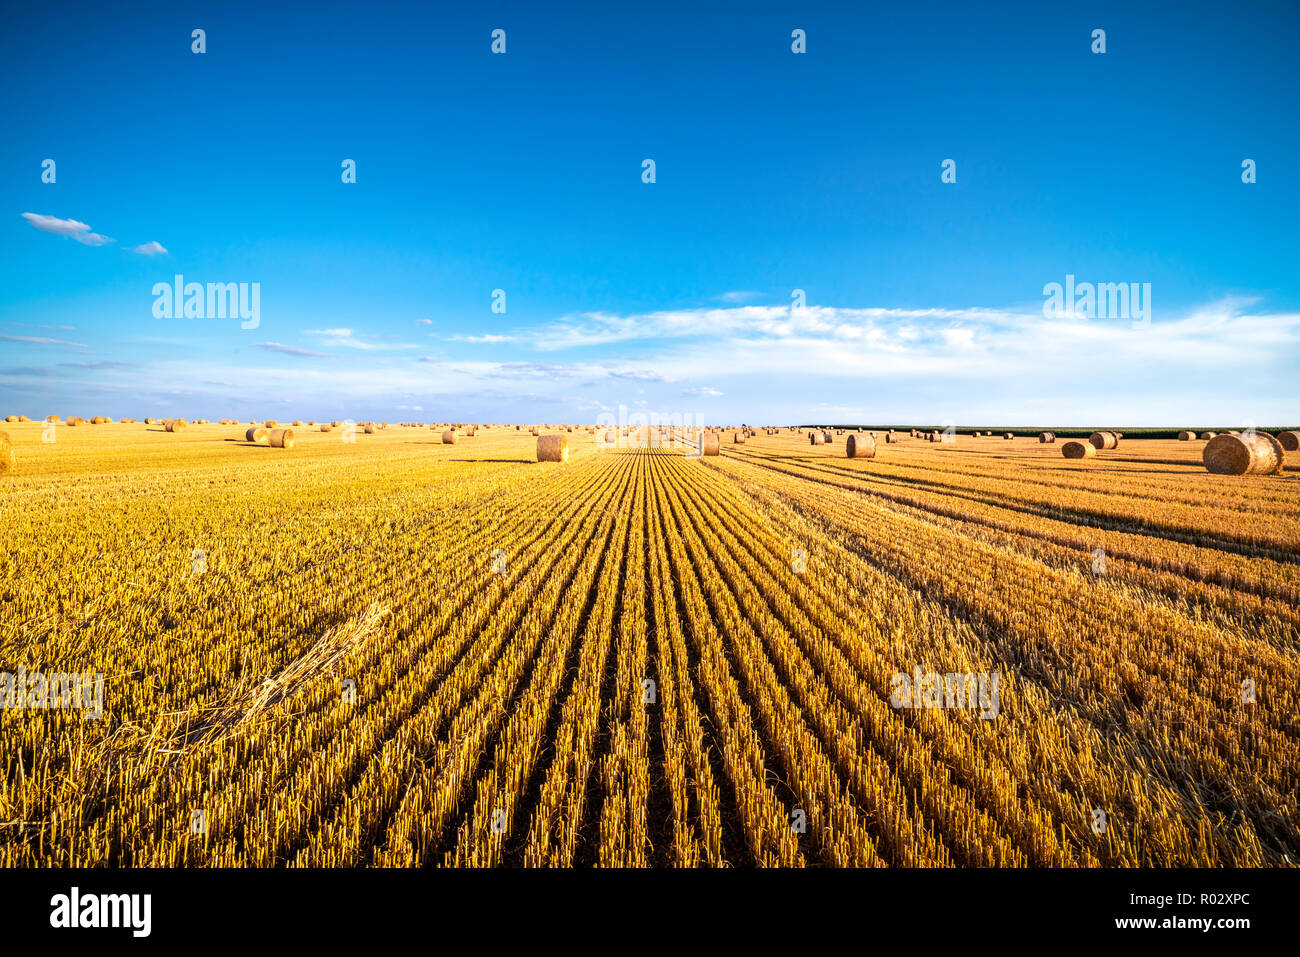 Field with straw bales, summer field, Germany | Feld mit Strohballen, Sommerfeld - Stock Image